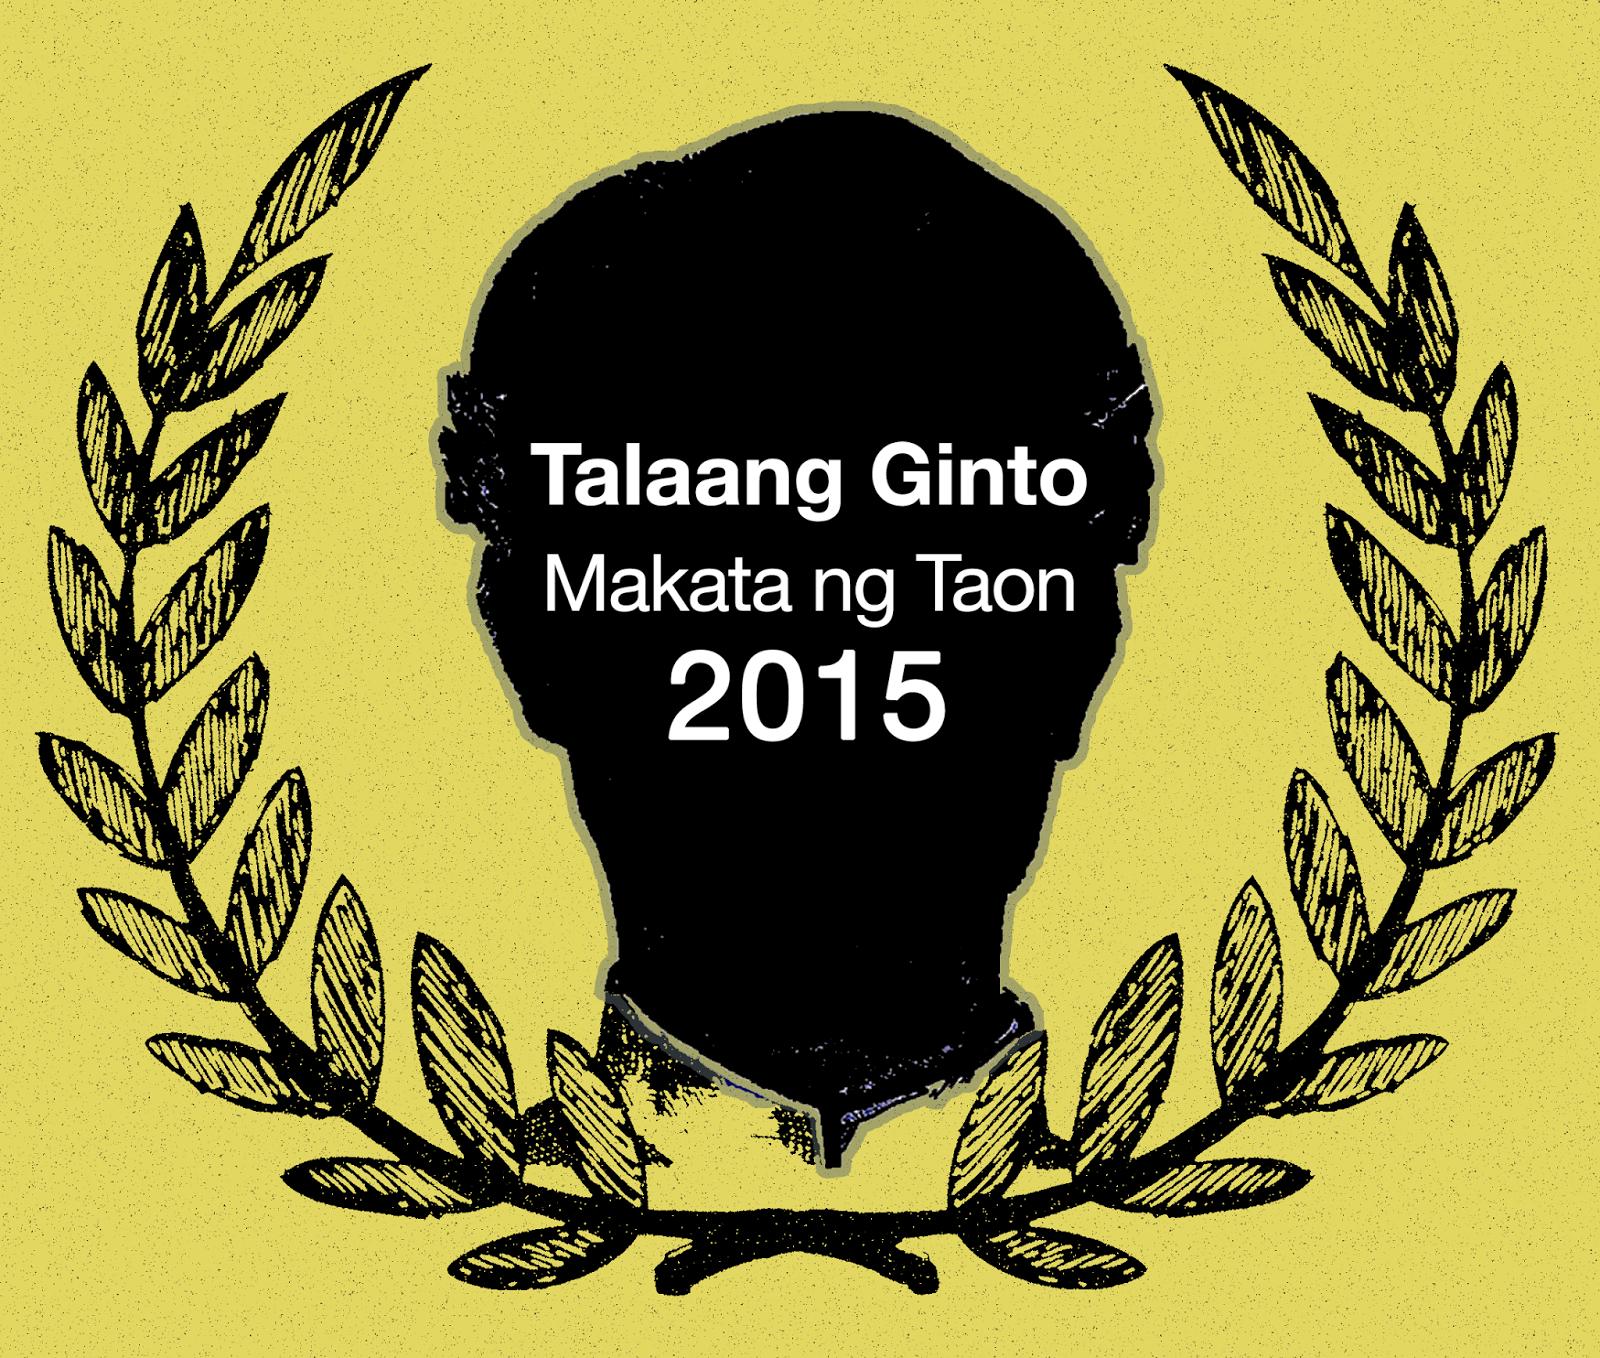 http://www.boy-kuripot.com/2014/10/kwf-makata-ng-taon-2015.html